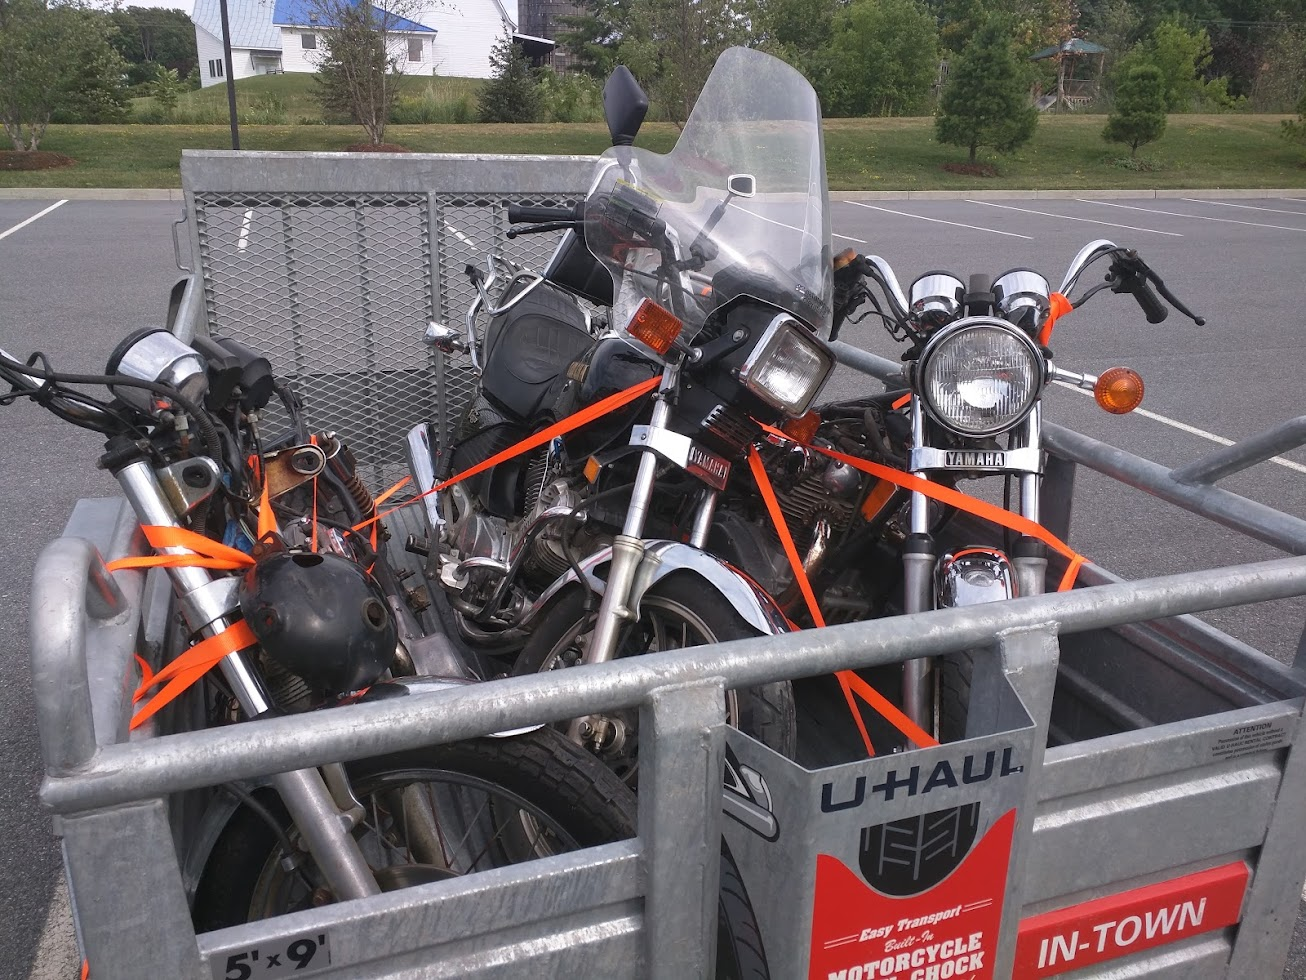 Craigslist Vt Motorcycle Trailers | Reviewmotors co